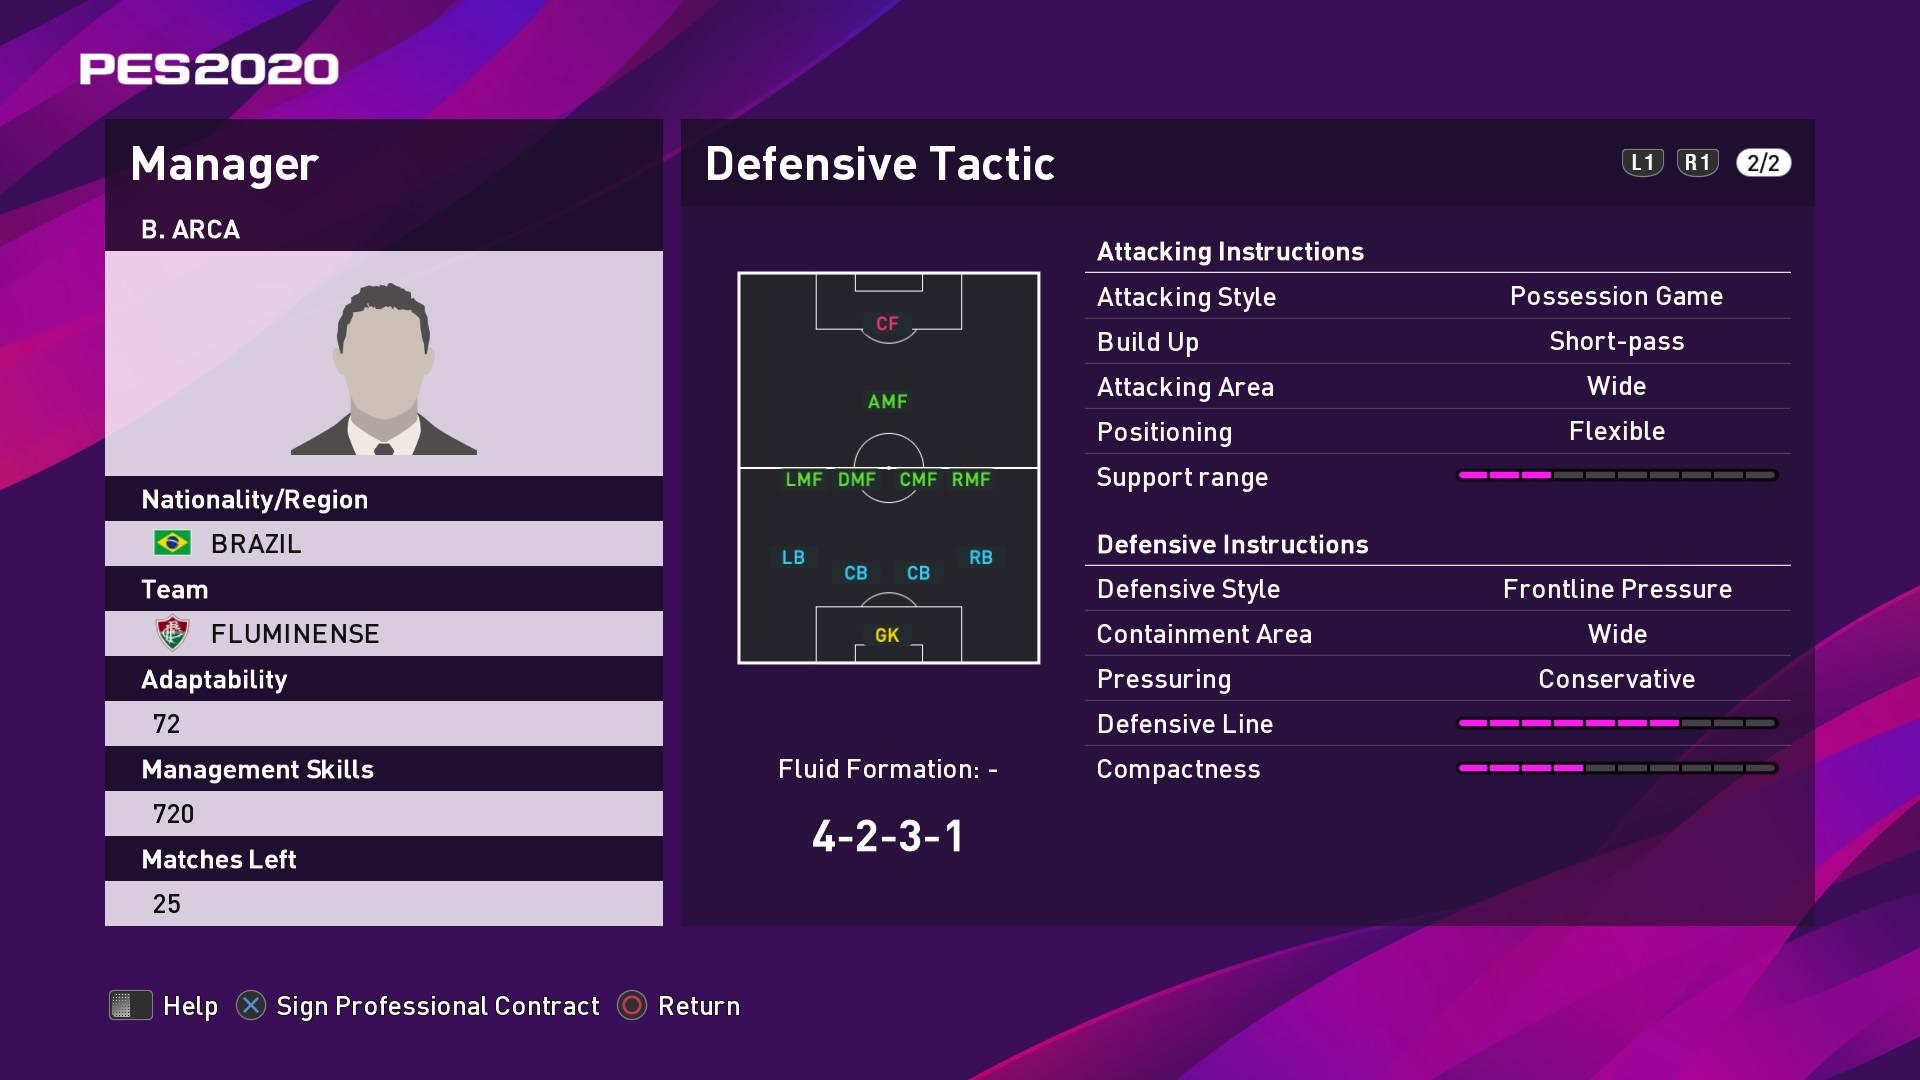 B. Arca (Odair Hellmann) Defensive Tactic in PES 2020 myClub